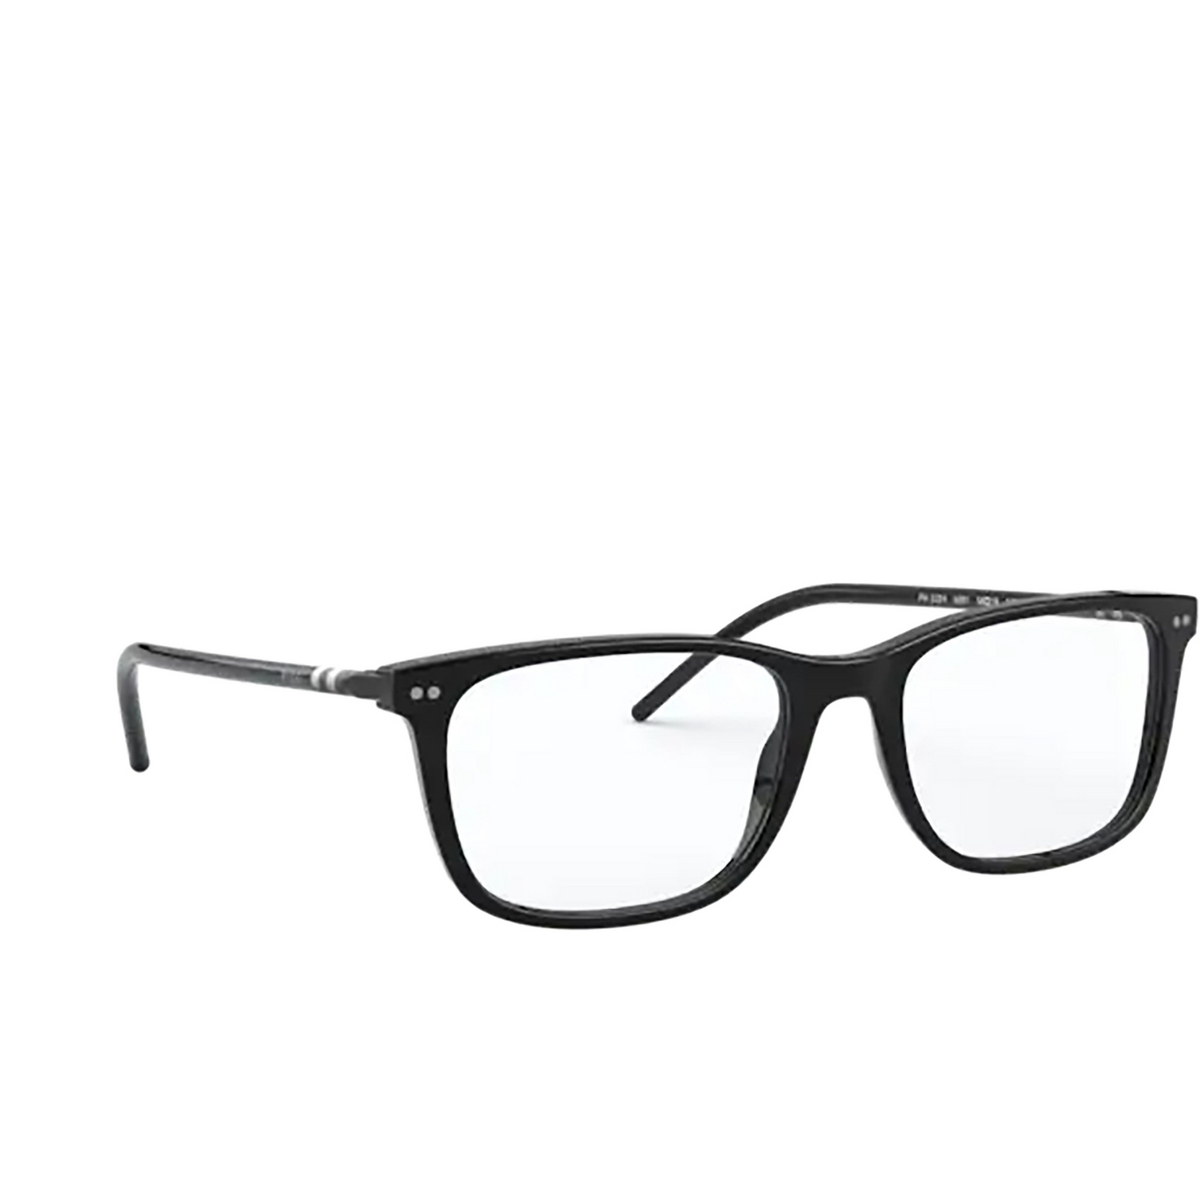 Polo Ralph Lauren® Square Eyeglasses: PH2224 color Shiny Black 5001.